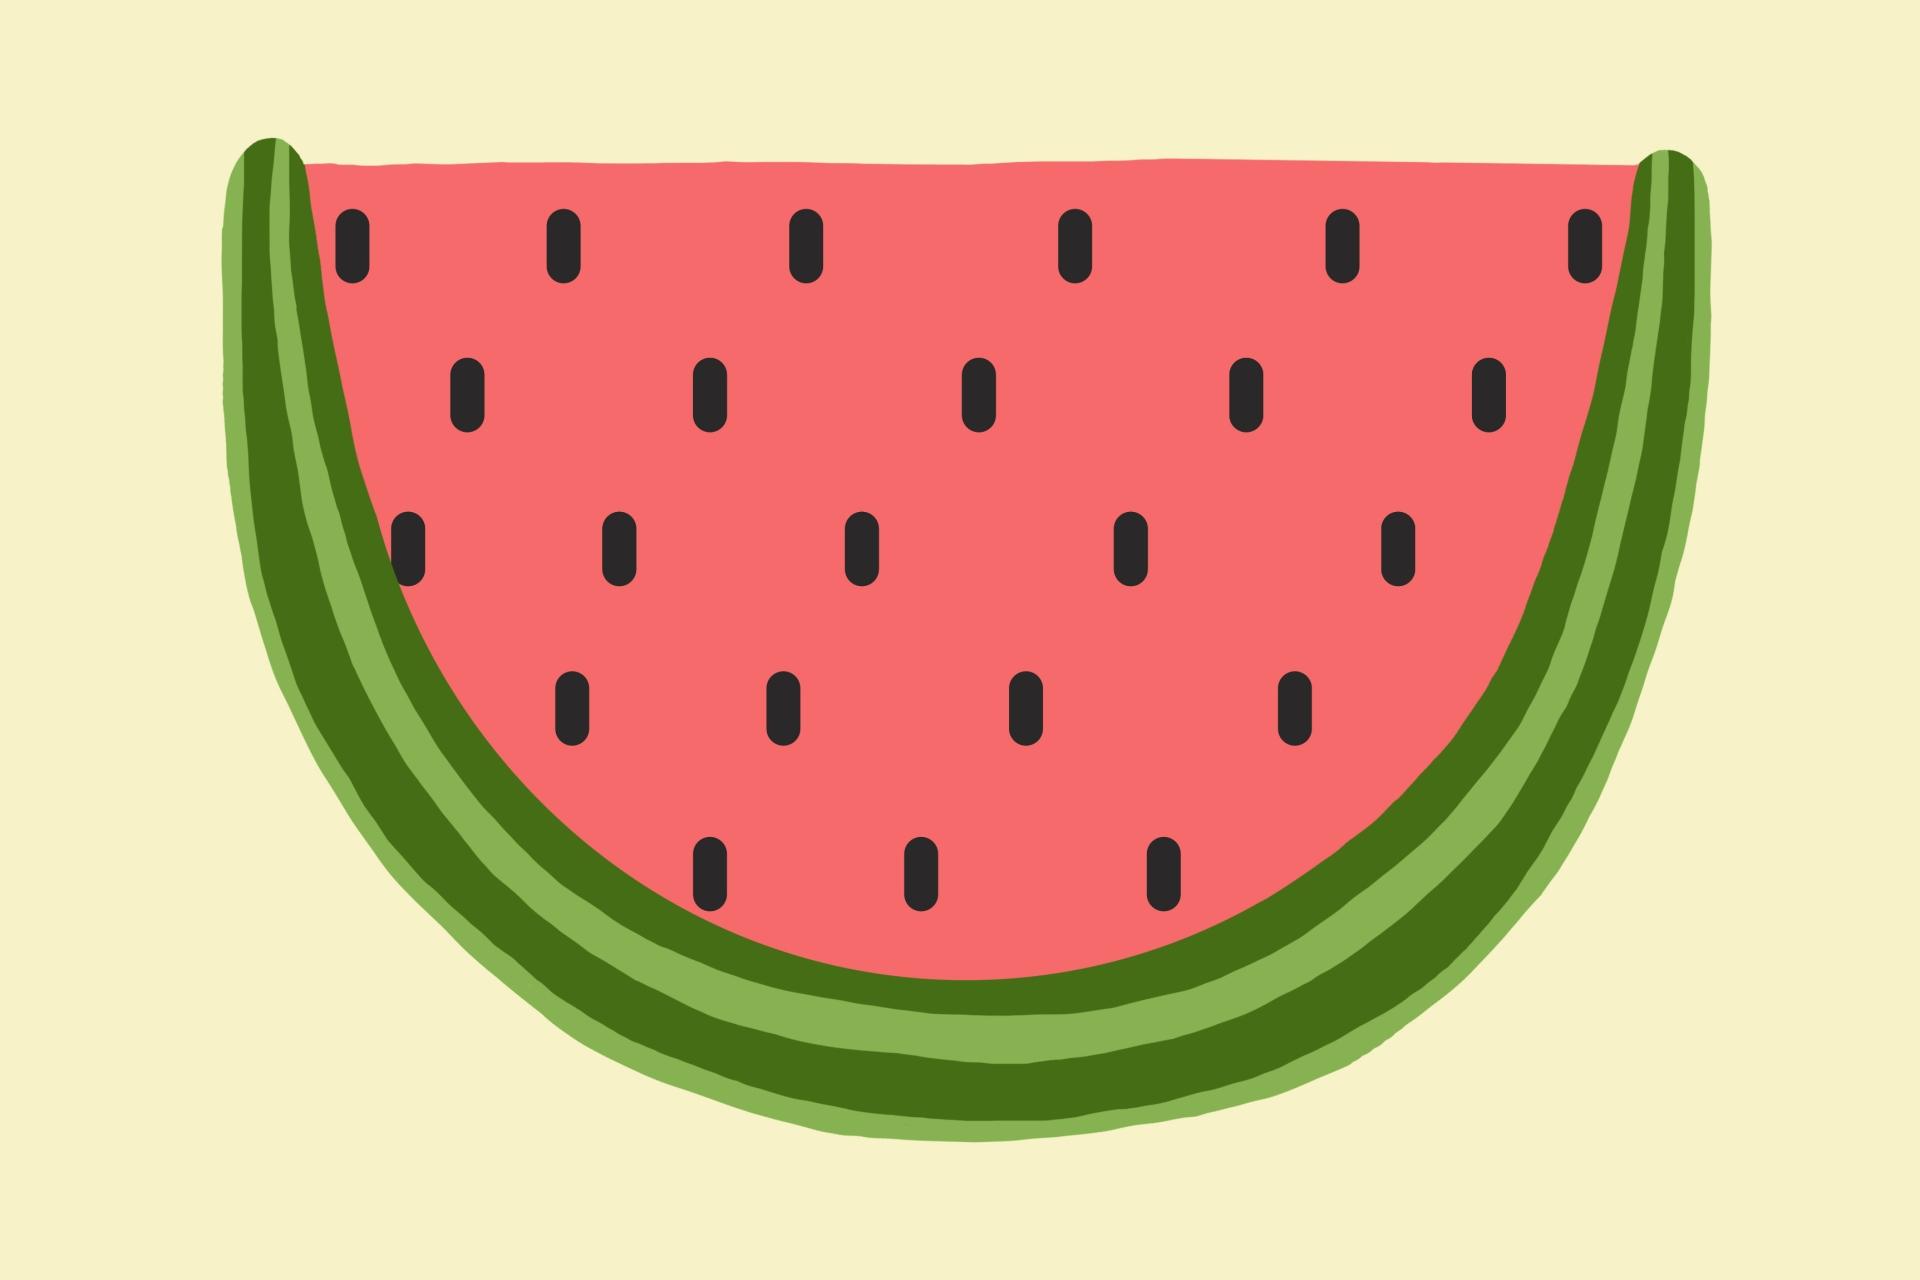 Watermelon Puns